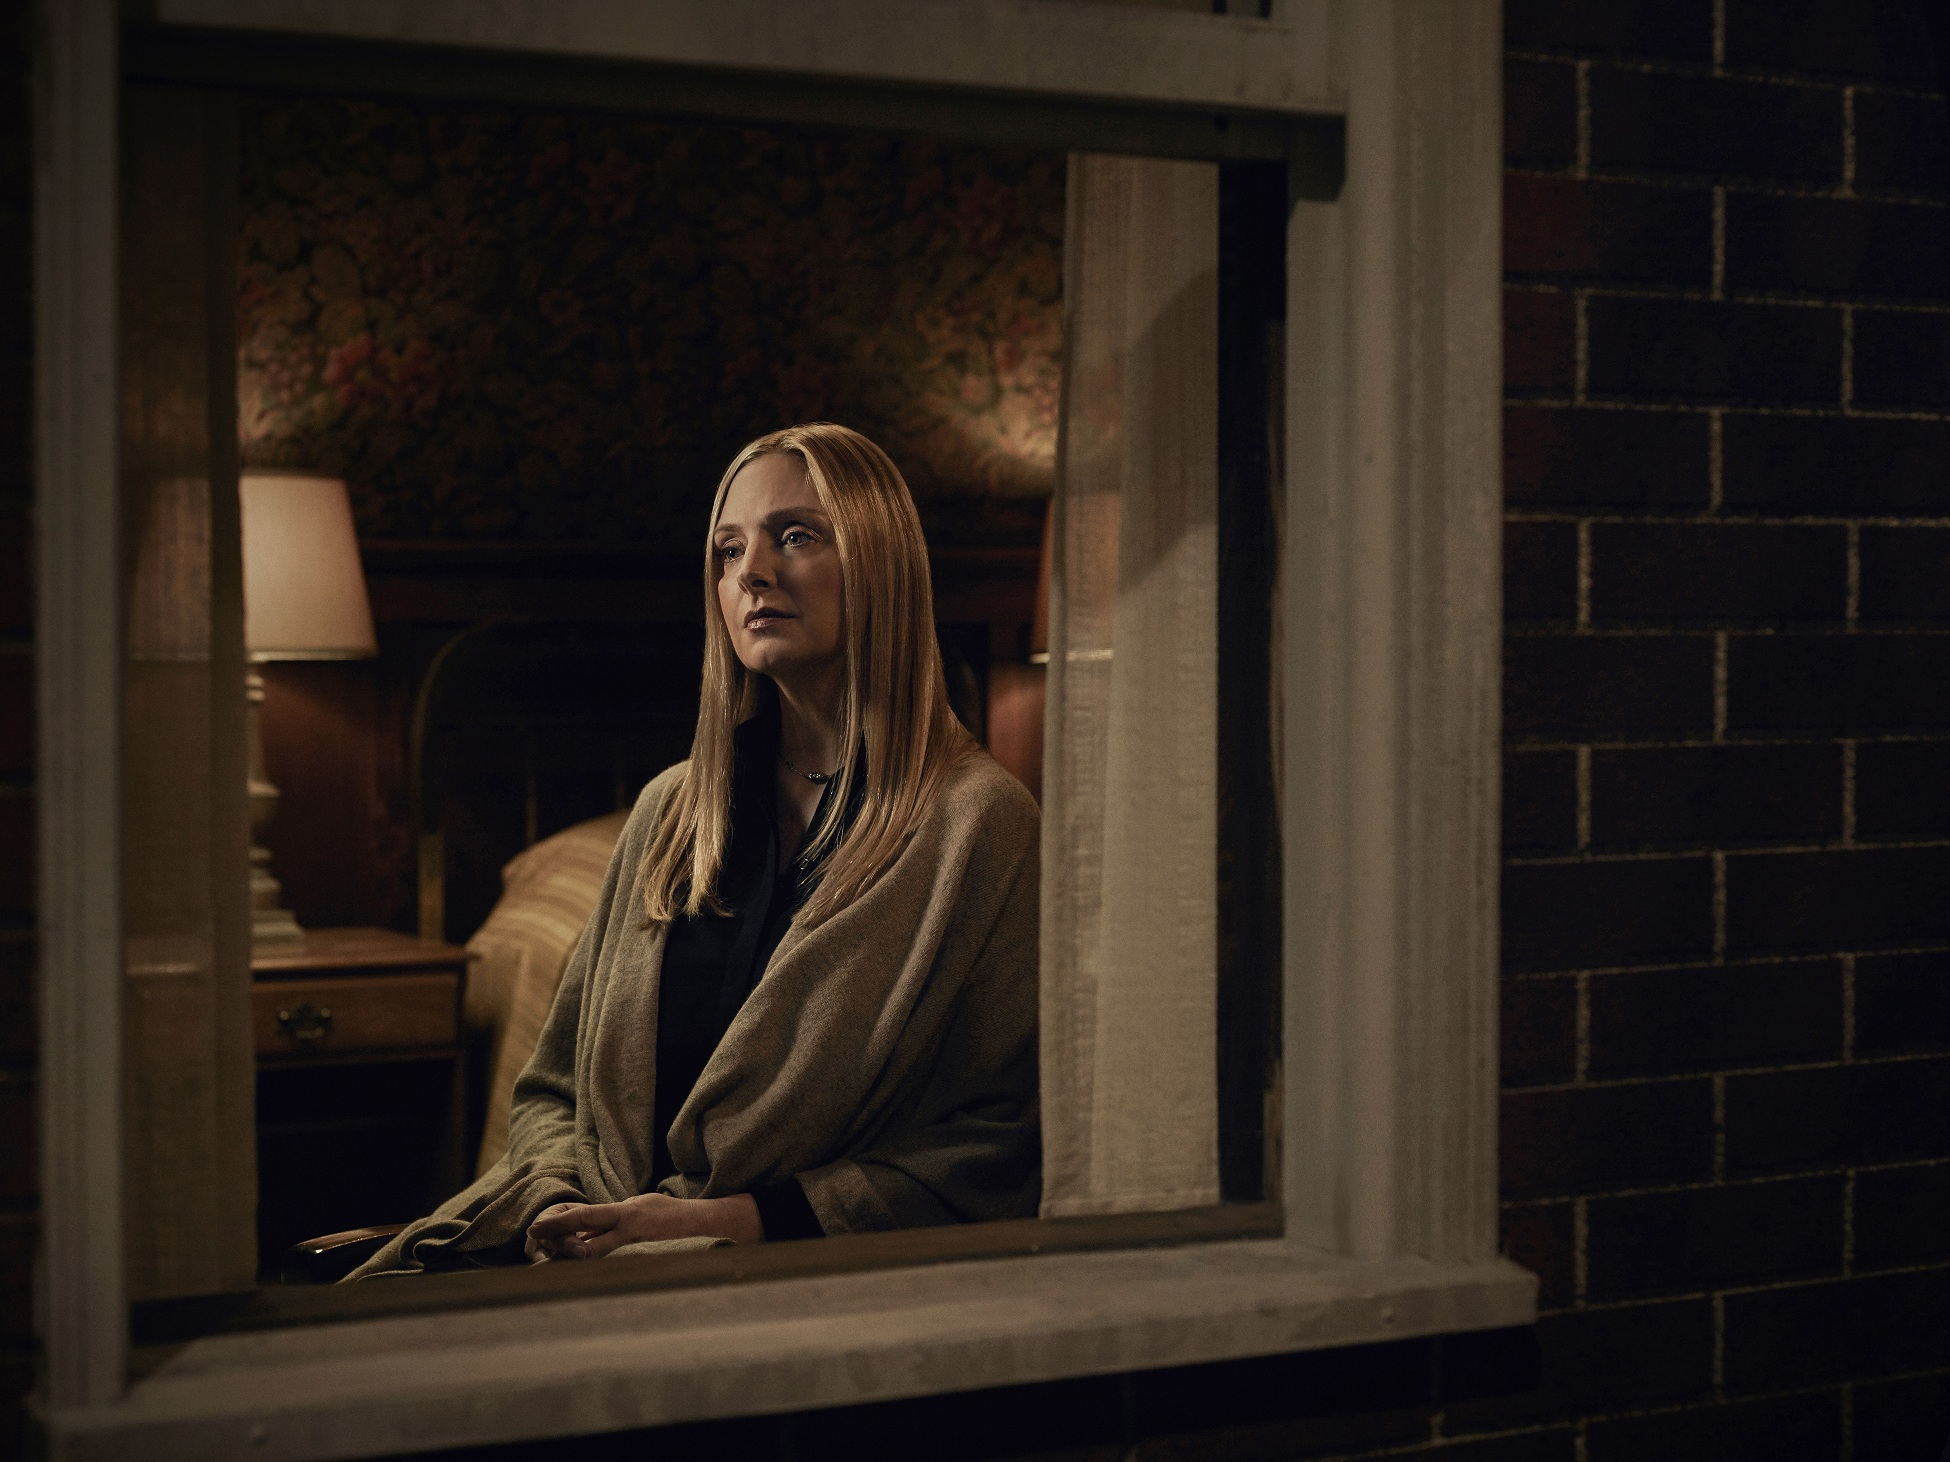 WAYWARD PINES: Hope Davis as Megan Fisher in season two of WAYWARD PINES premiering Wednesday, May 25 (9:00-10:00 PM ET/PT) on FOX. ©2016 Fox Broadcasting Co. Cr: Patrick Hoelck/FOX